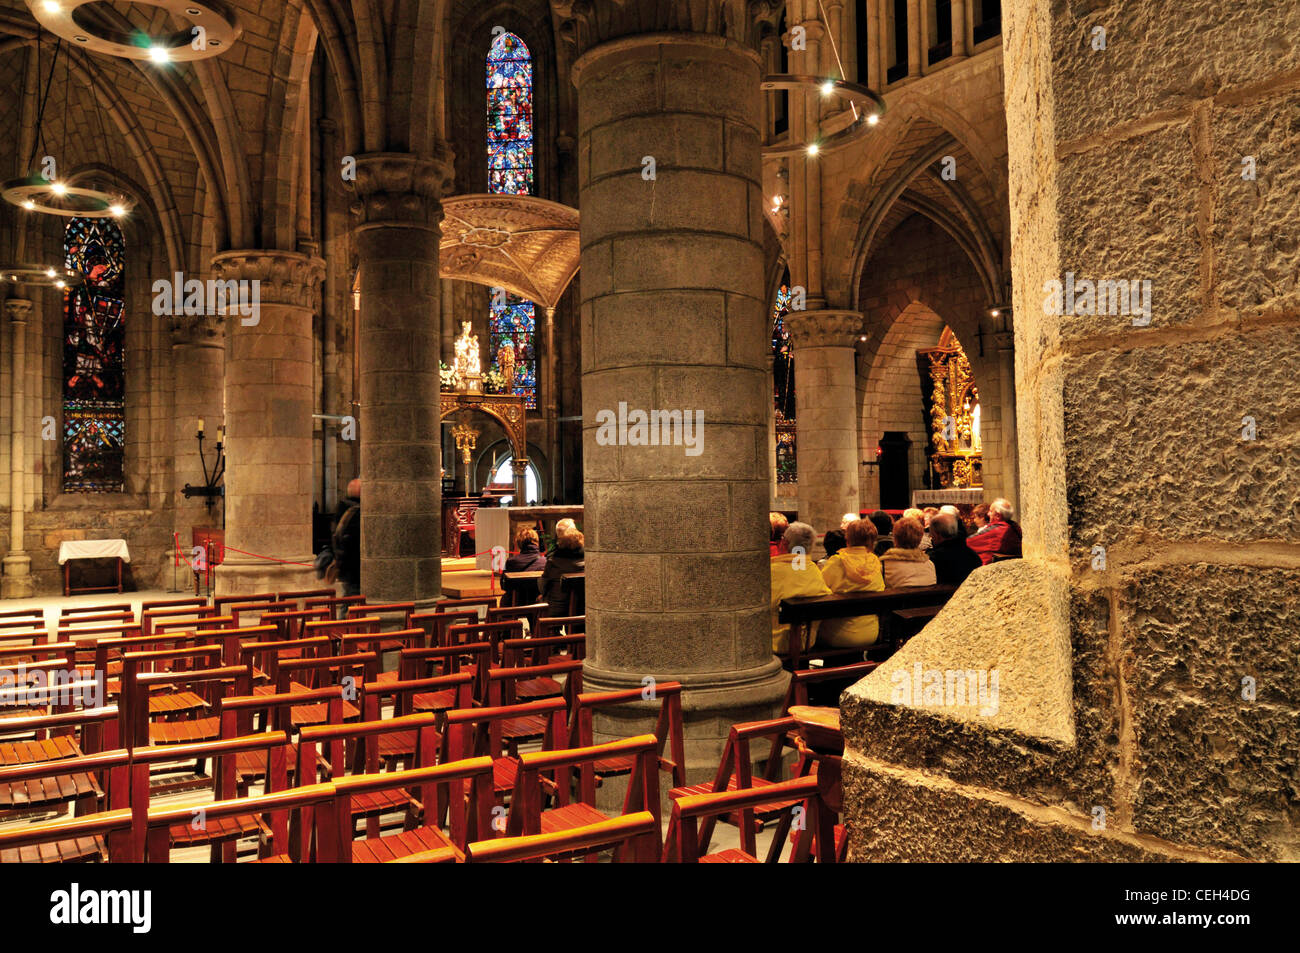 Spain, St. James Way: Pilgrim´s mass at the church La Colegiata de Santa Maria Real in Roncesvalles Stock Photo